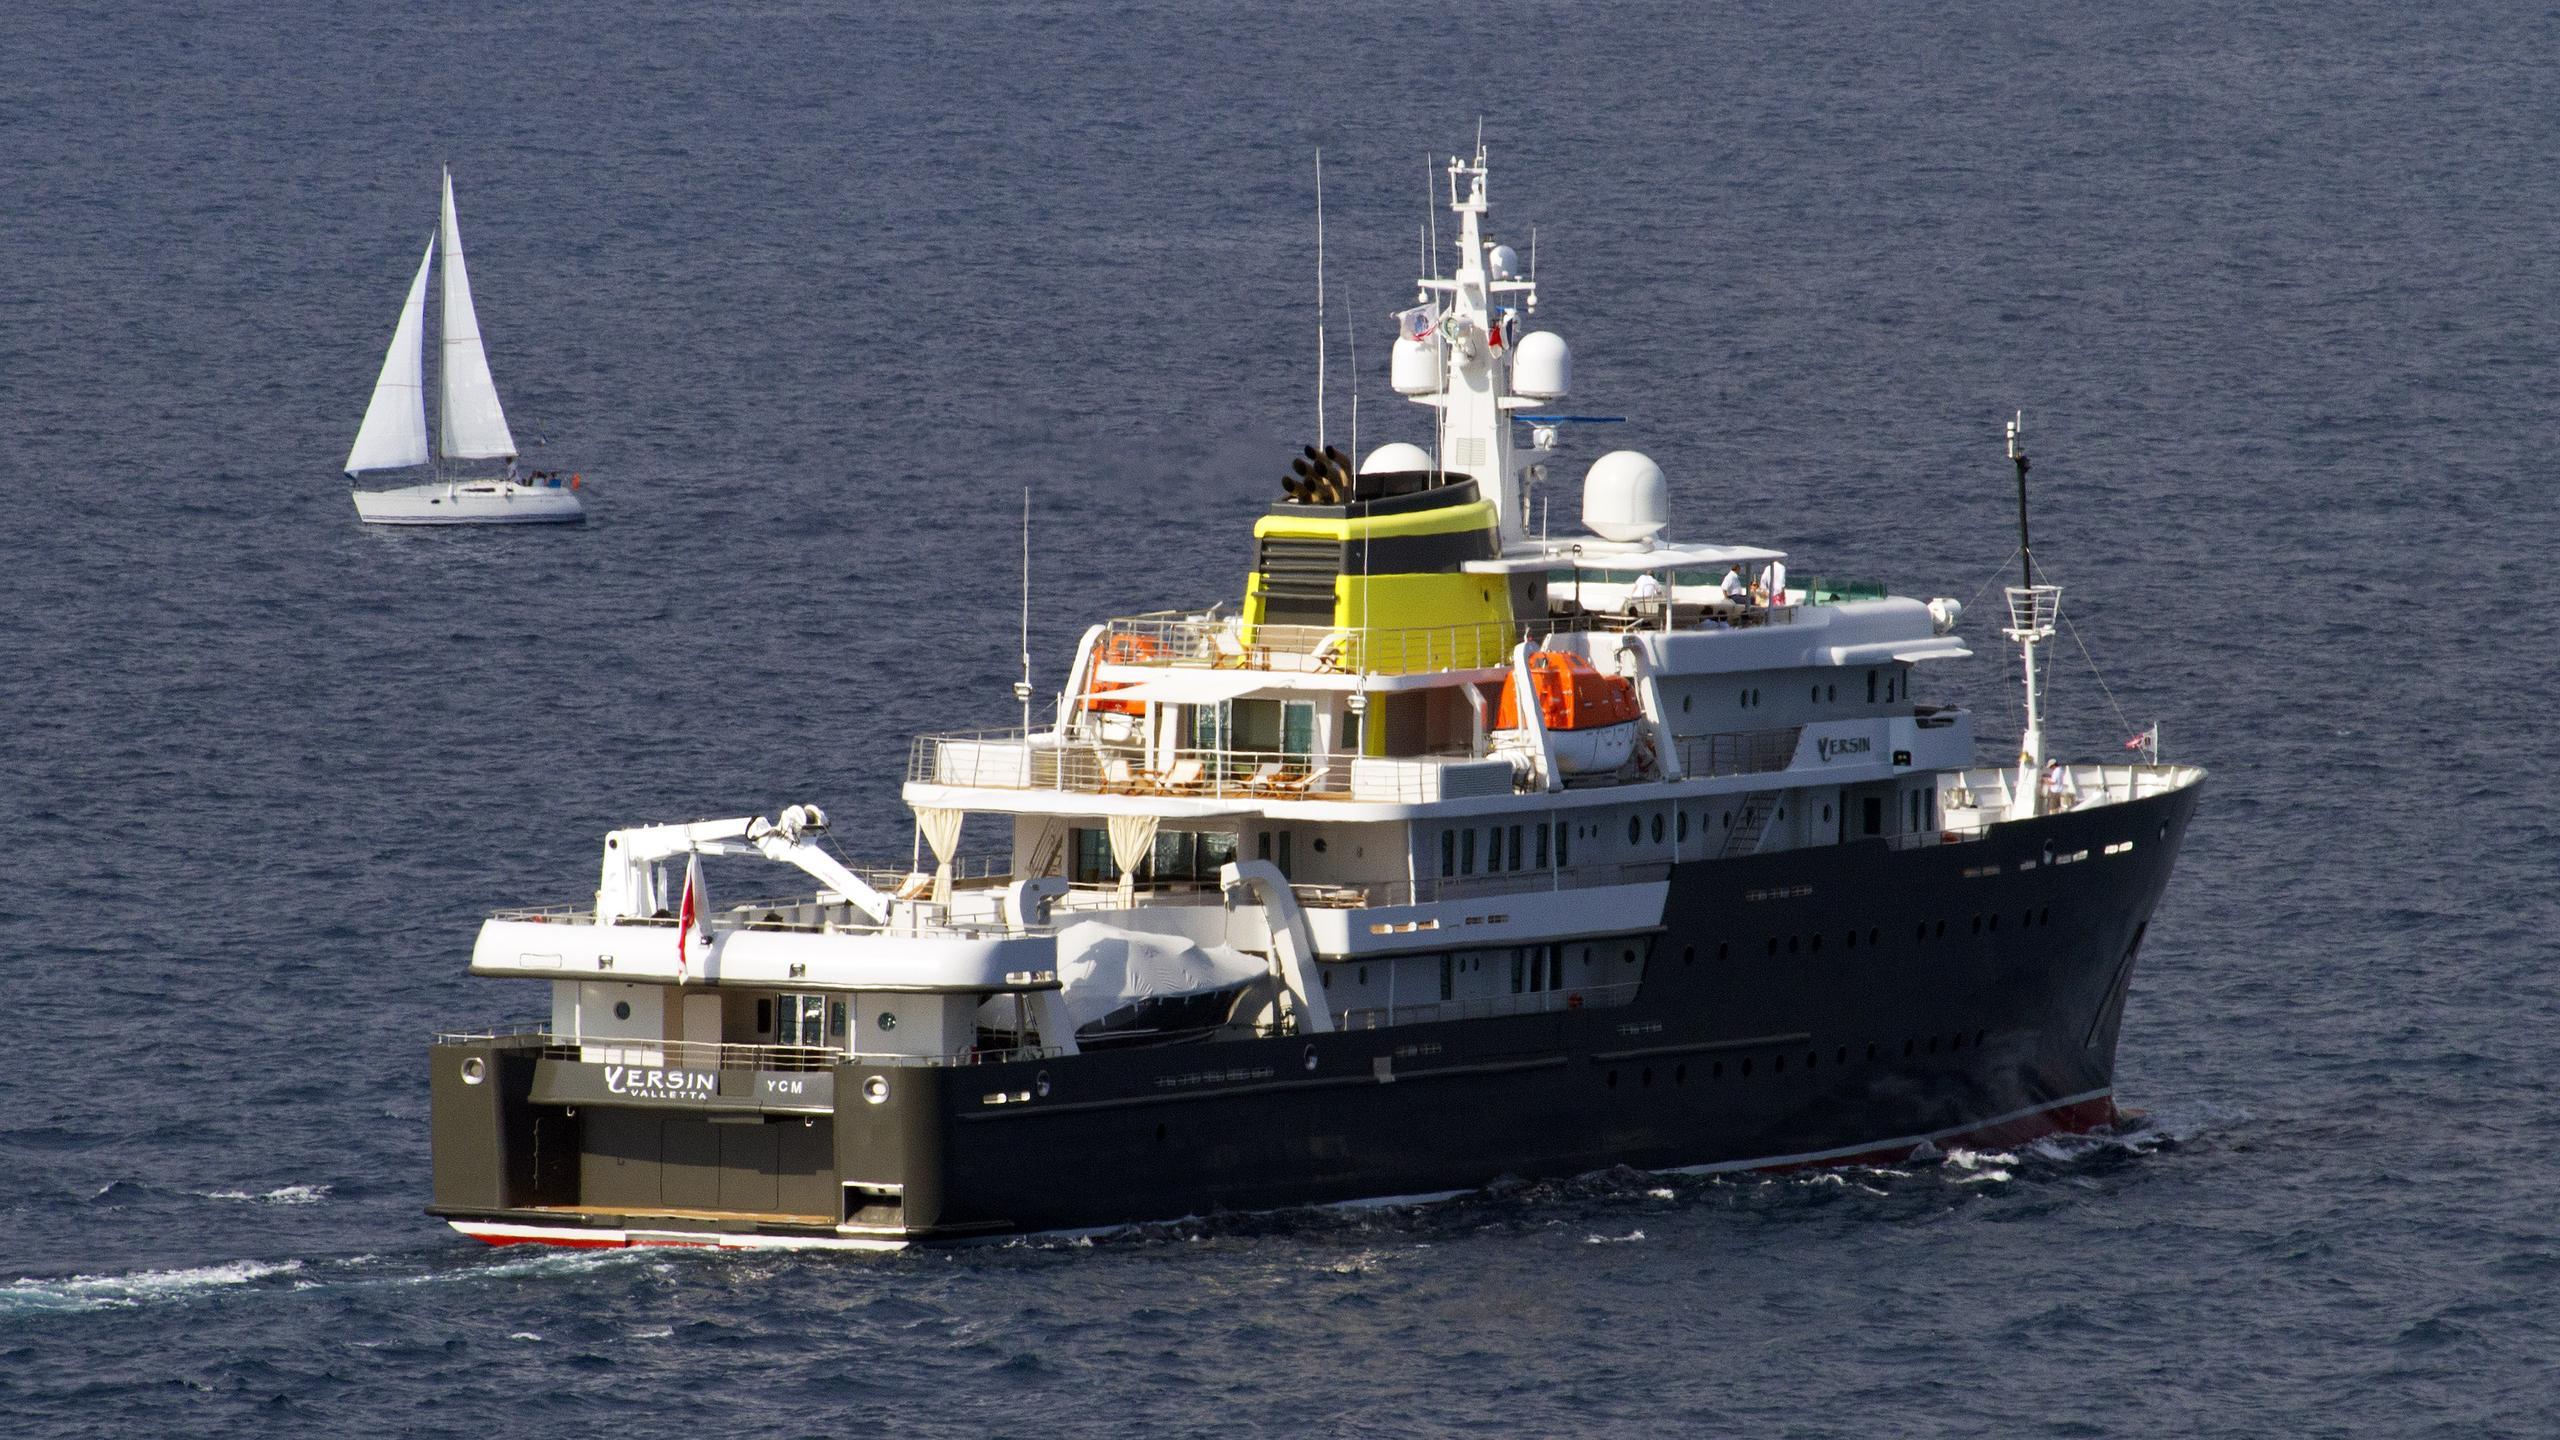 yersin-explorer-yacht-piriou-2015-77m-running-half-stern